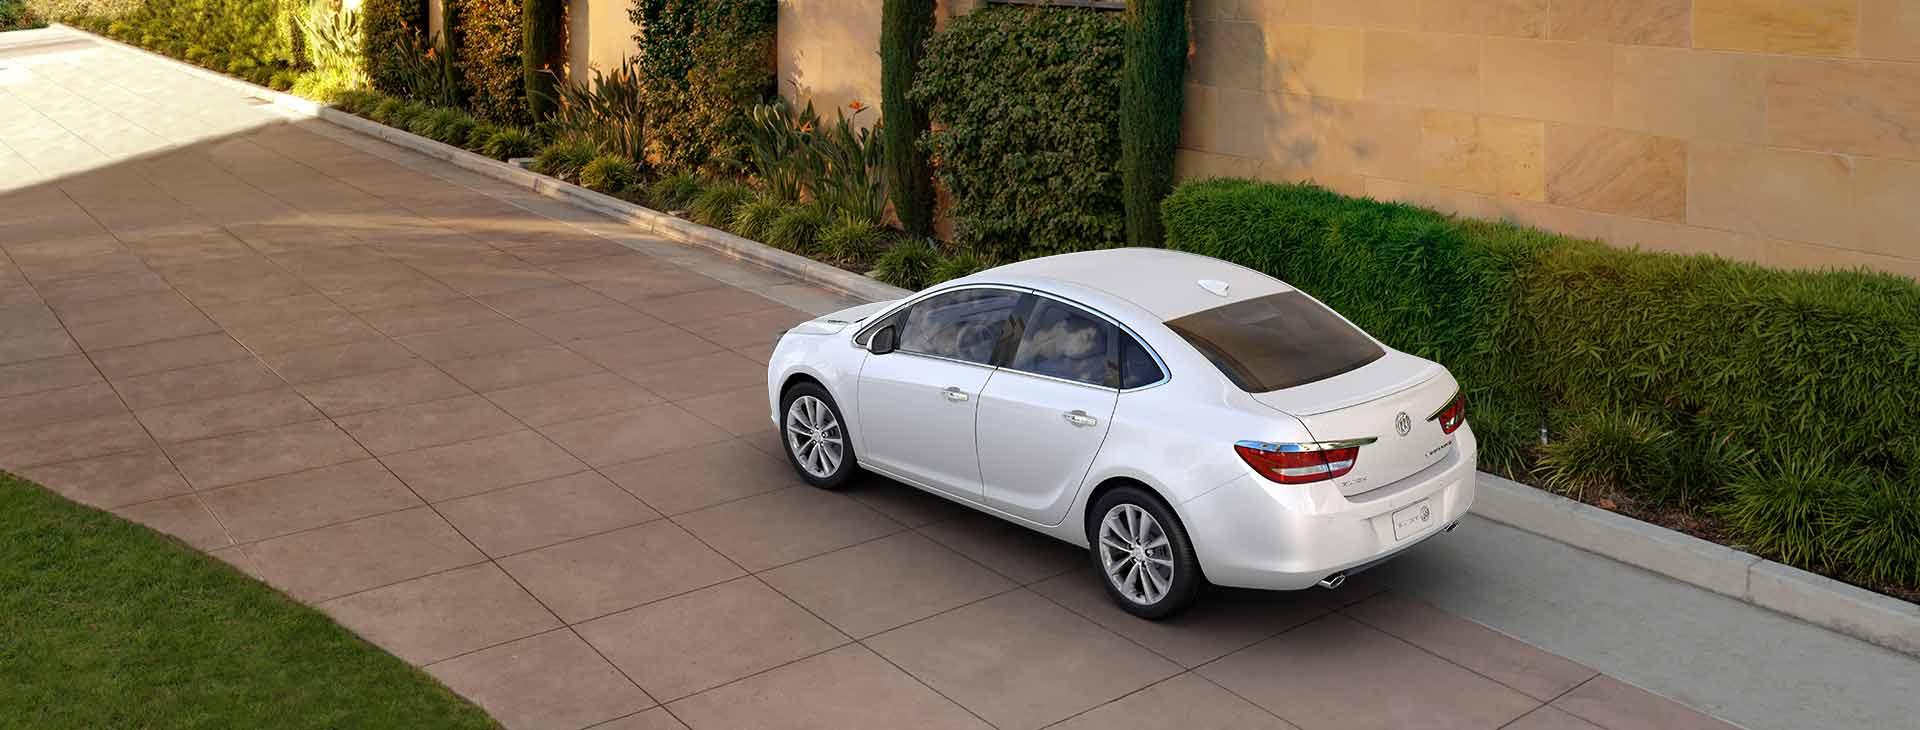 New Buick Verano Exterior main image